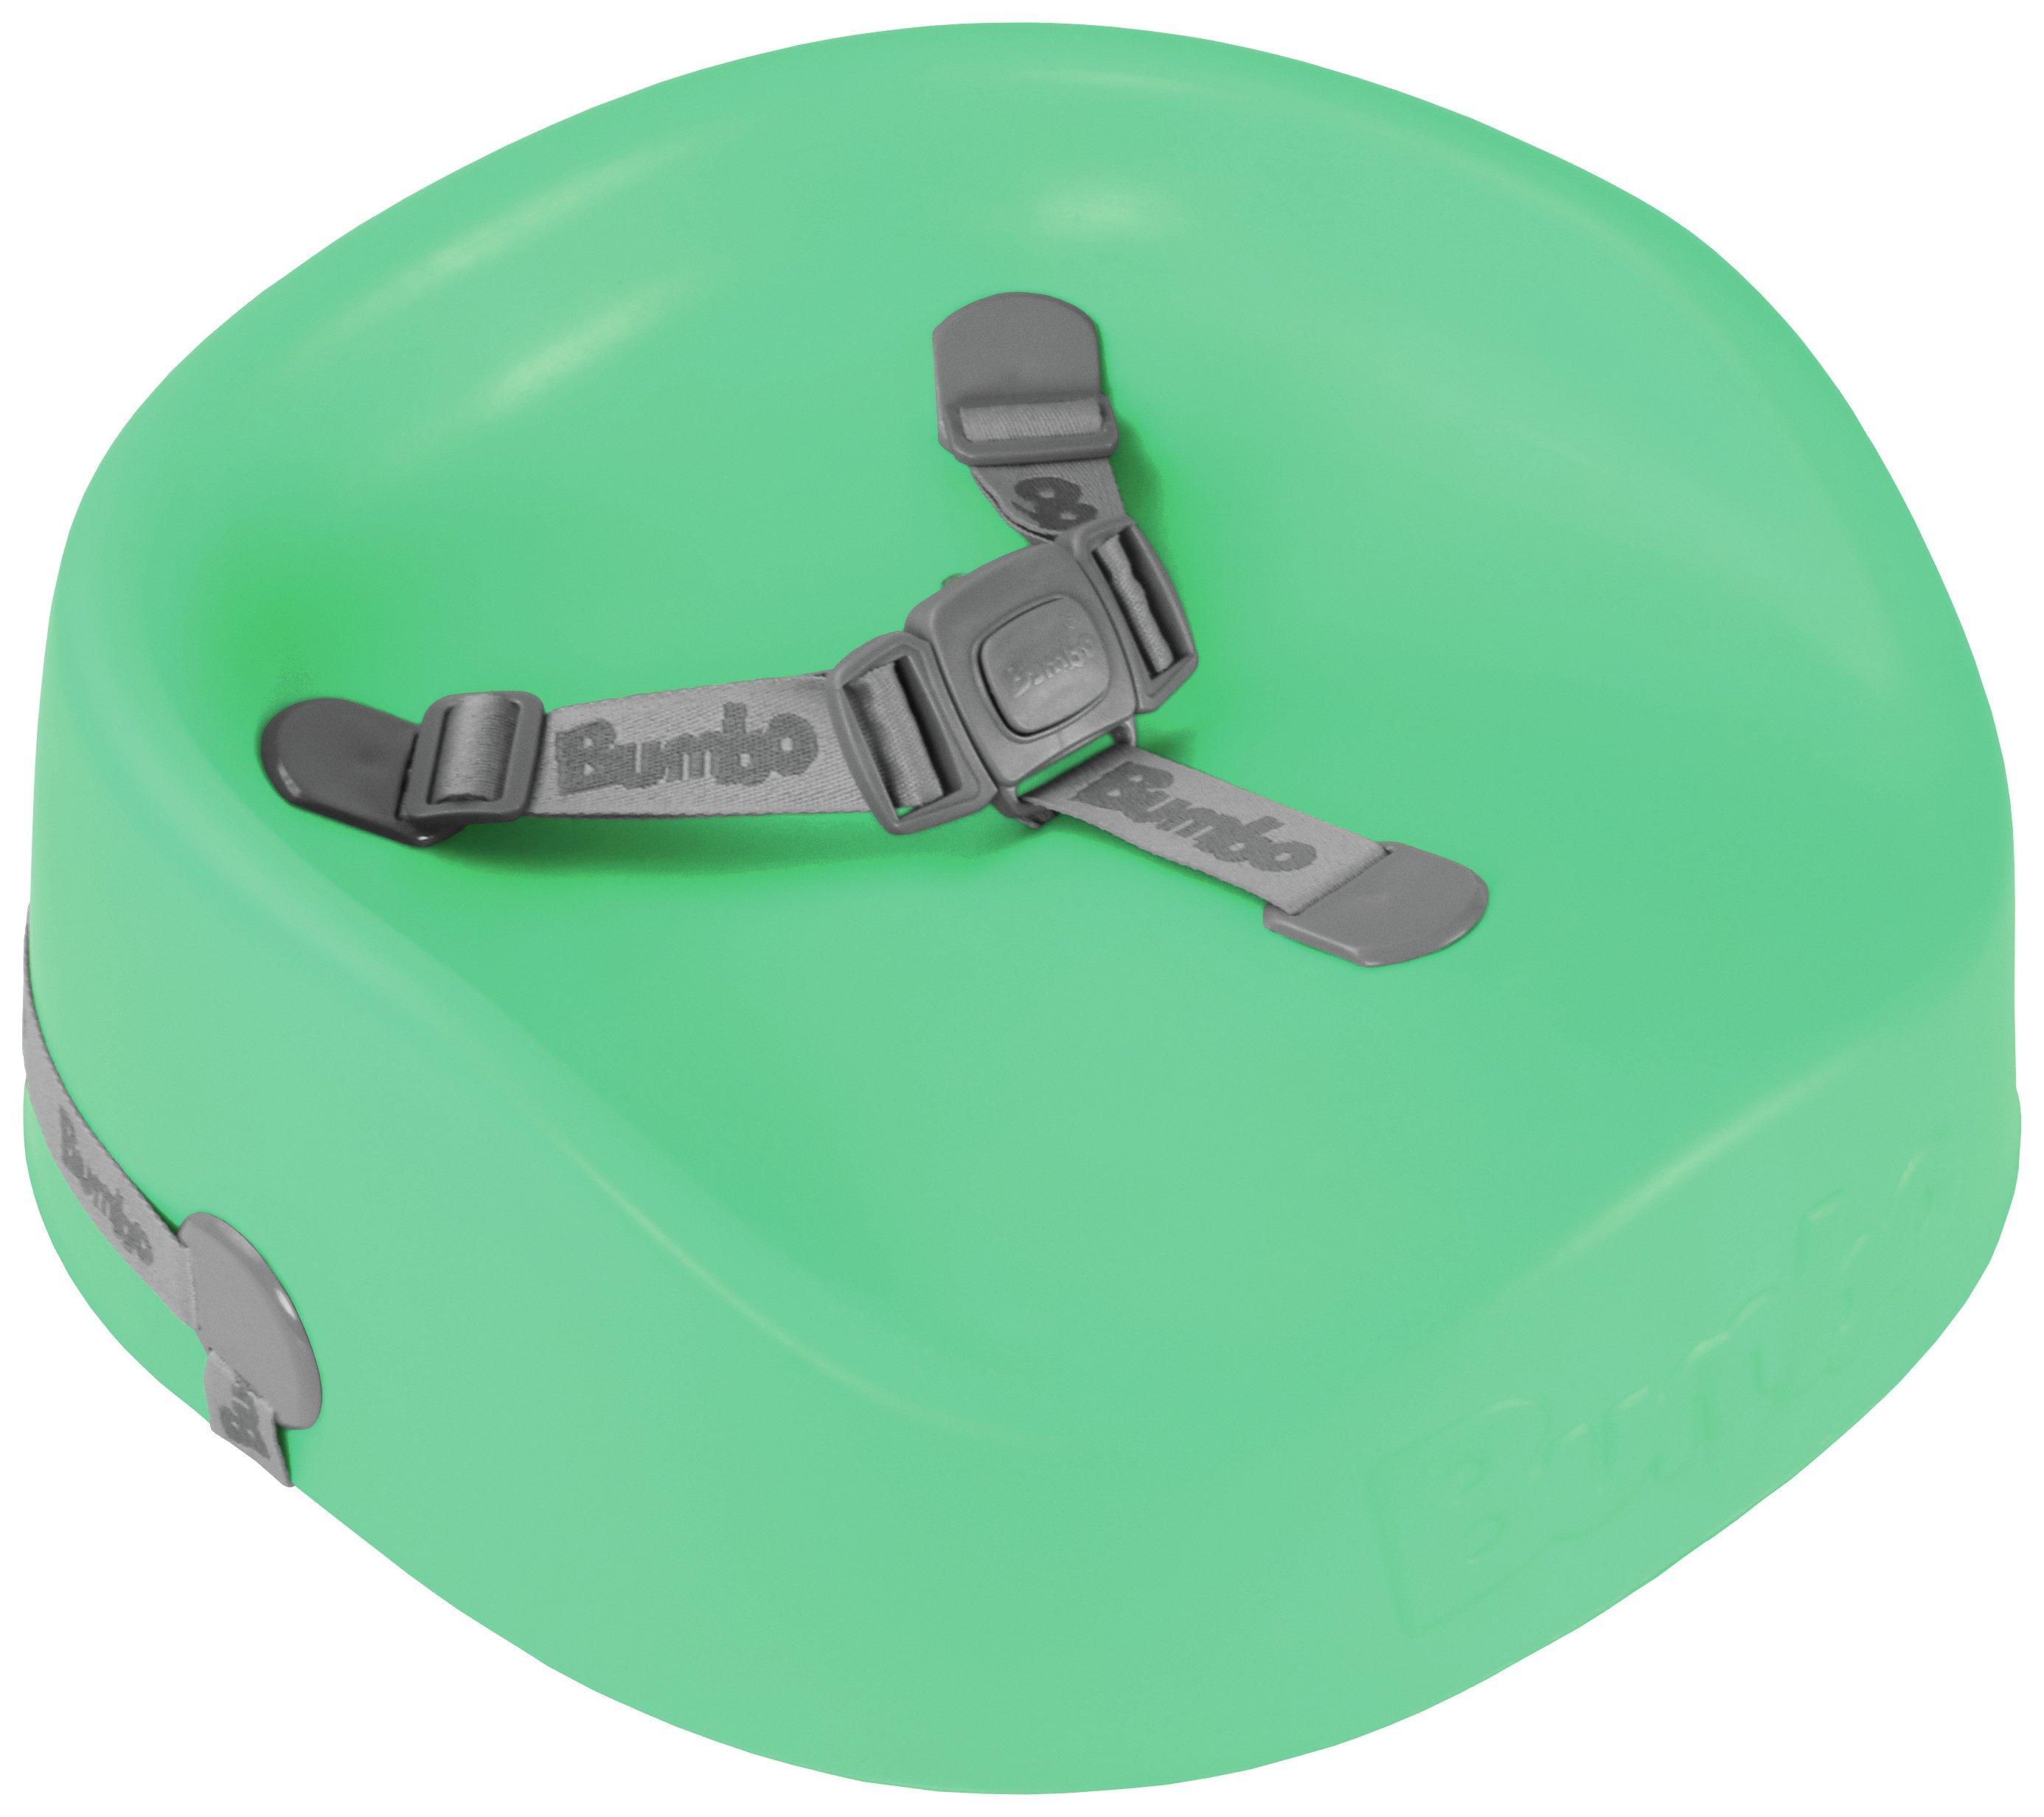 Image of Bumbo Booster Seat - Aqua.